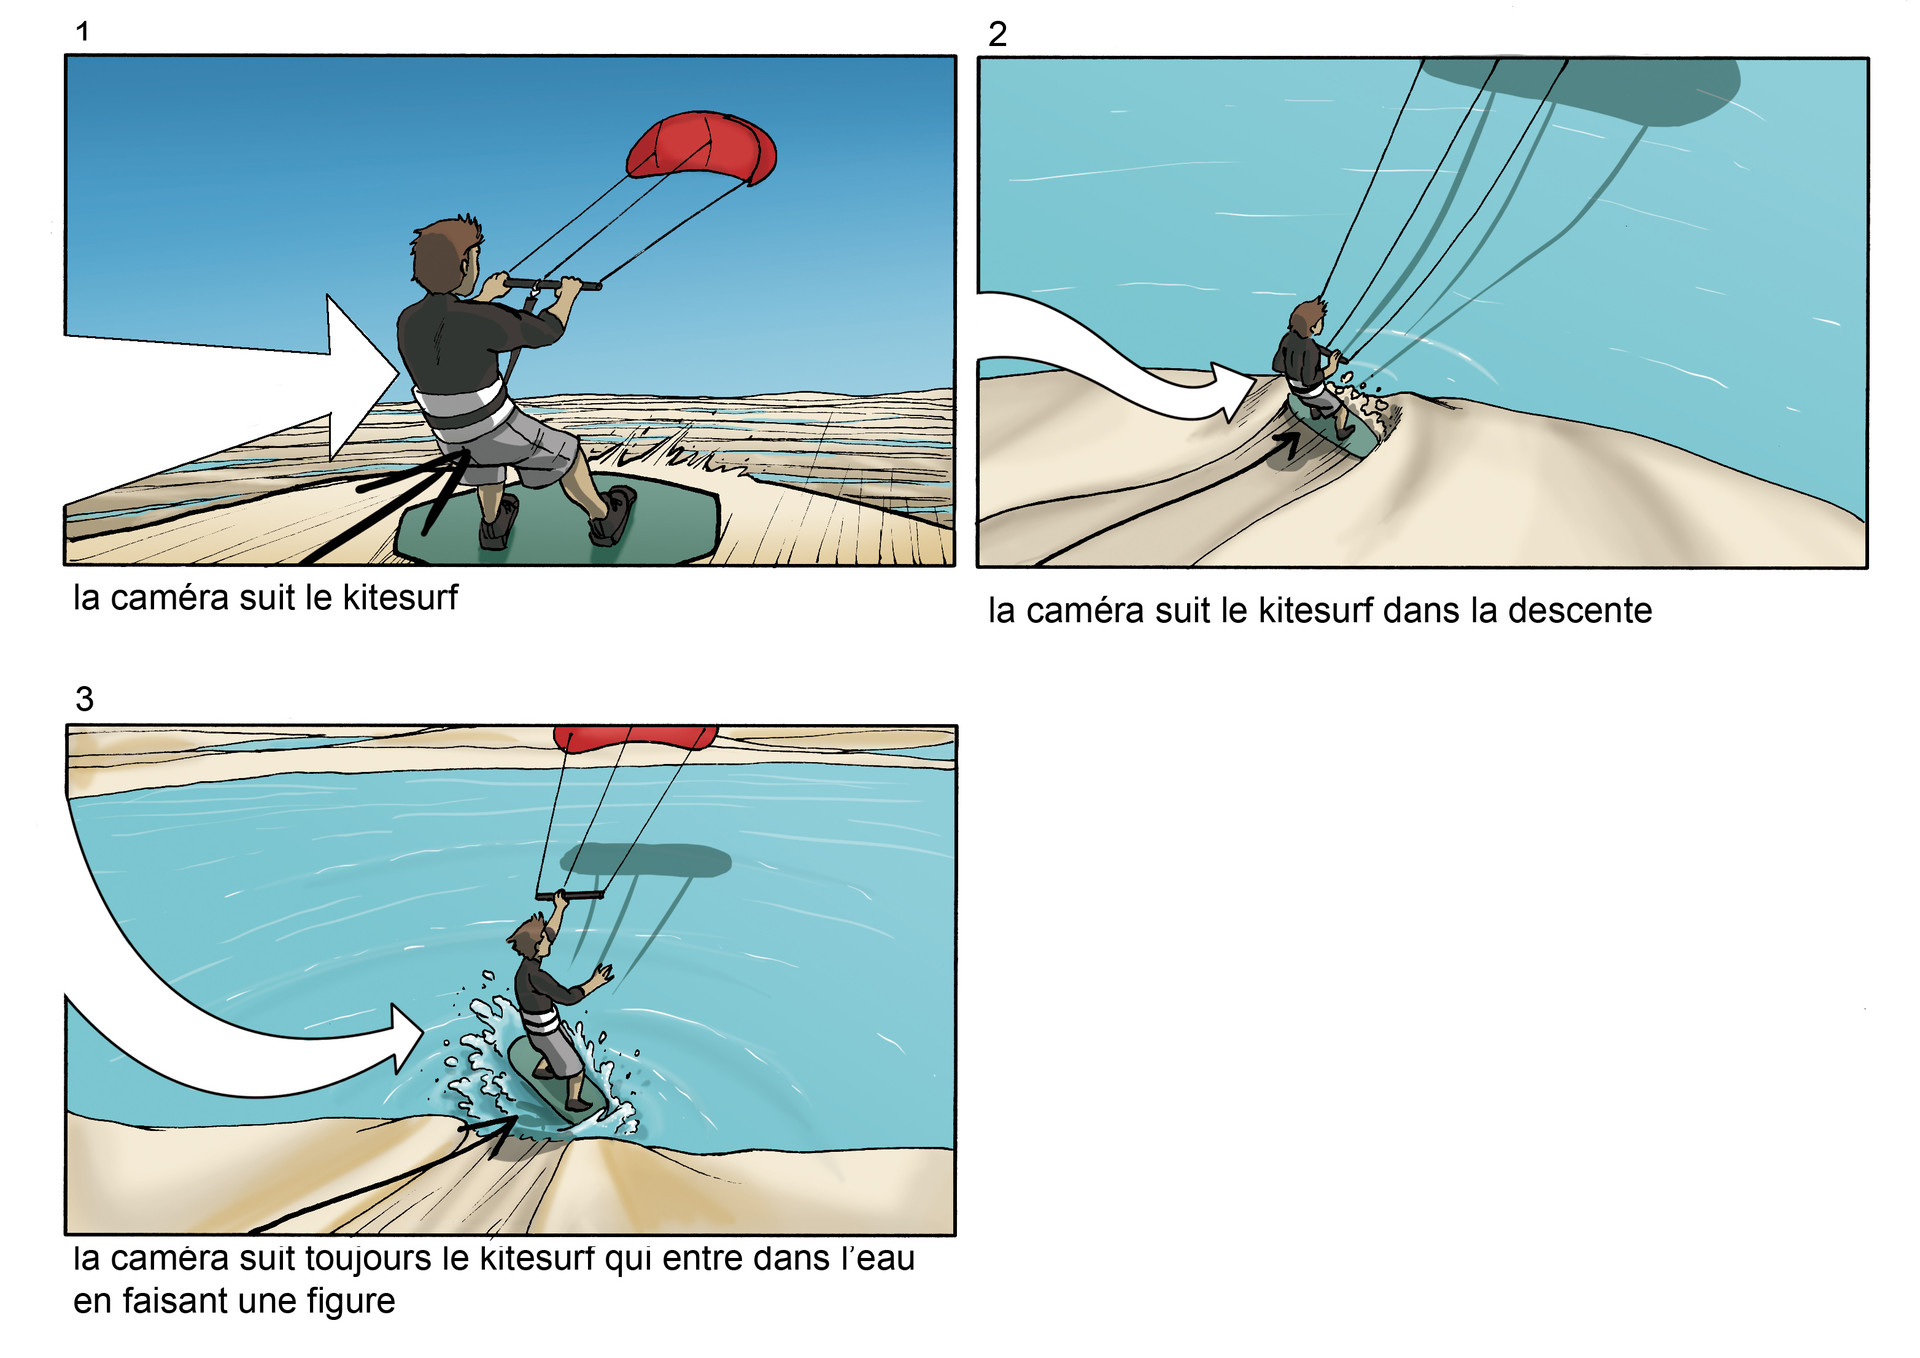 Nina hayer storyboard kitesurf 2